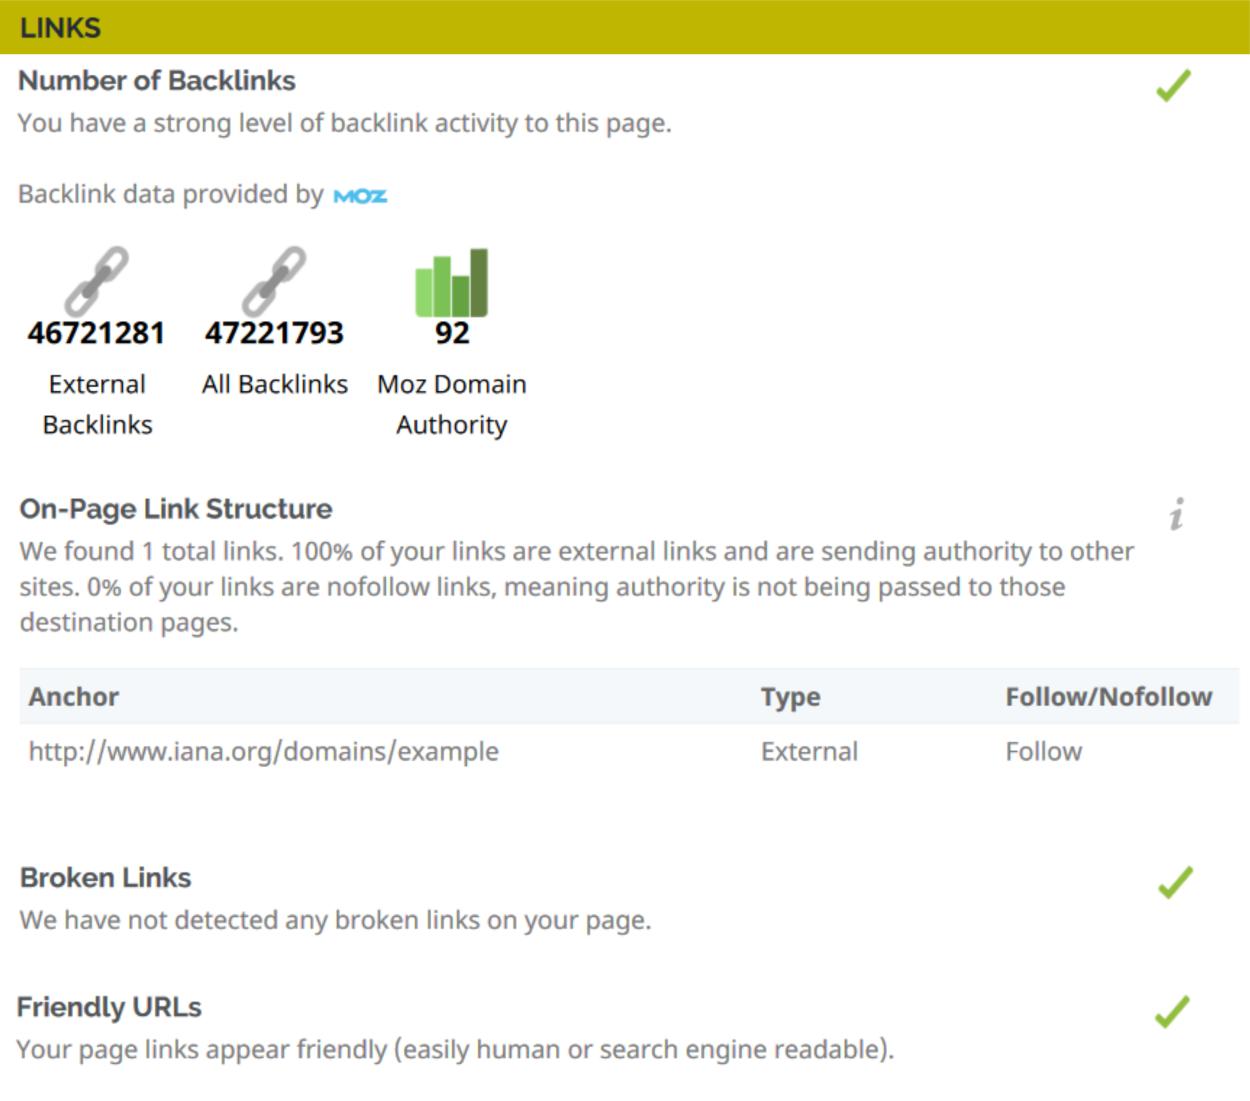 Website Audit Tool - Links